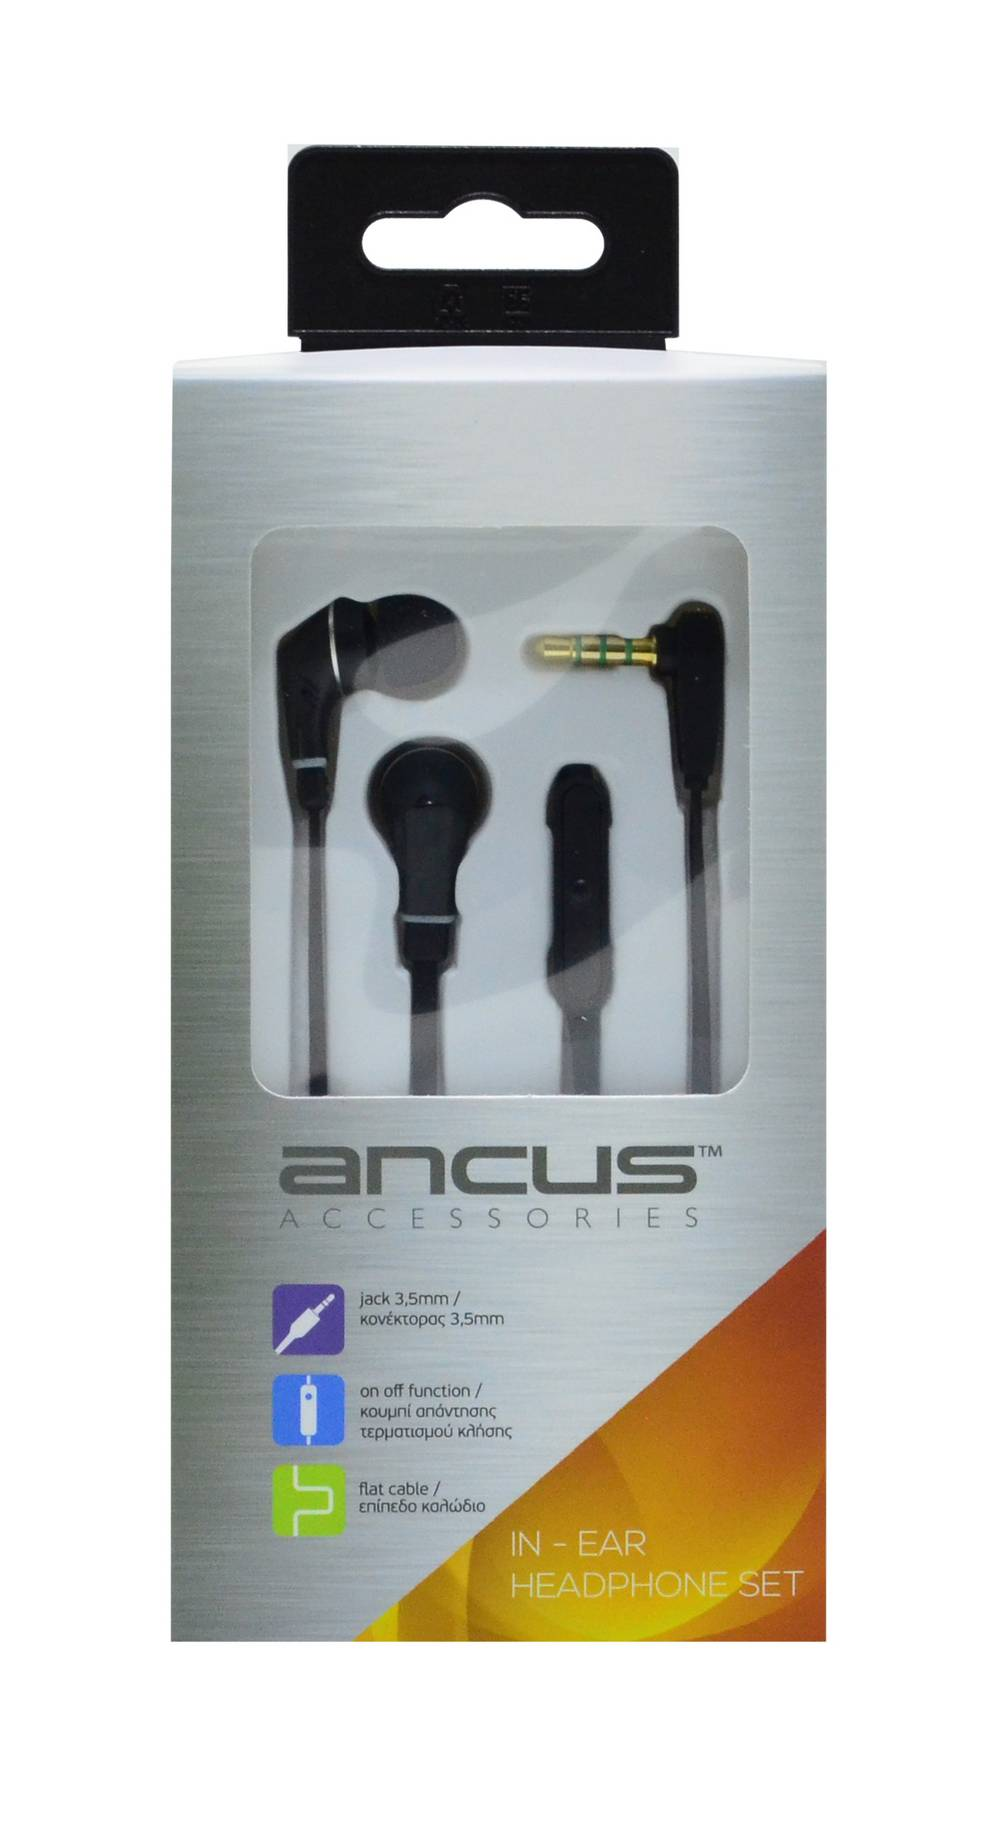 Hands Free Ancus Loop in-Earbud Stereo 3.5 mm για Apple-Samsung-HTC-Sony Μαύρο με Καλώδιο Πλακέ, Πλήκτρο Απάντησης